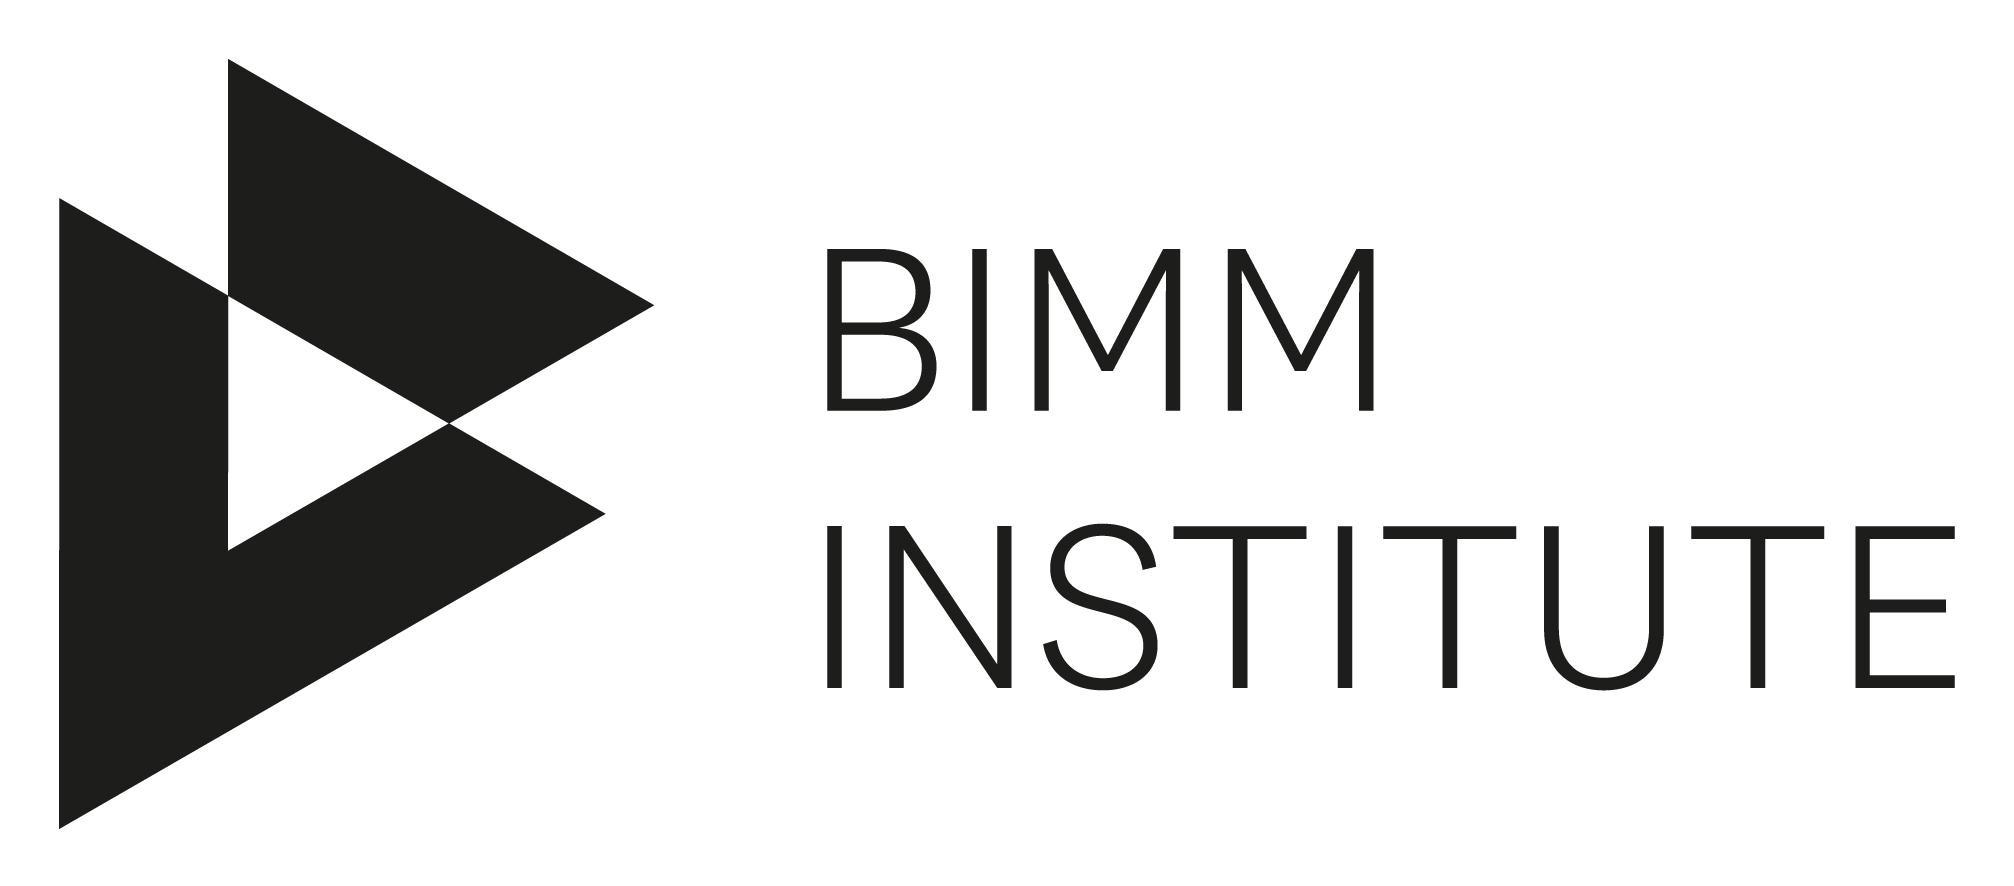 BIMM UK